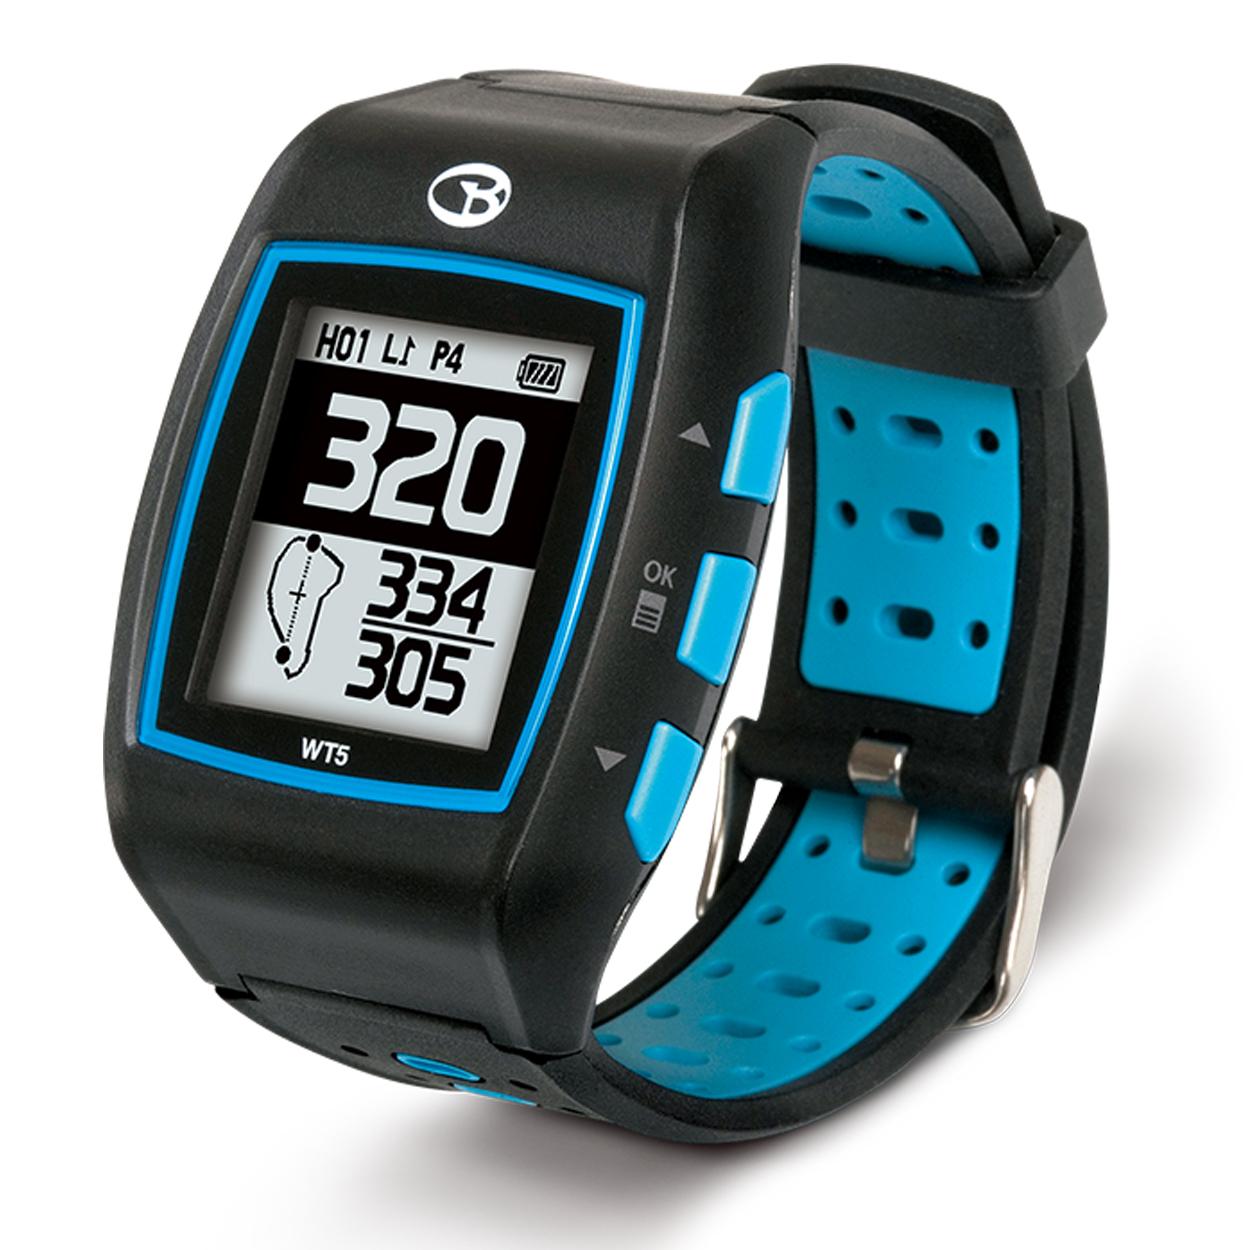 golfbuddy wt5 gps rangefinder watch. Black Bedroom Furniture Sets. Home Design Ideas